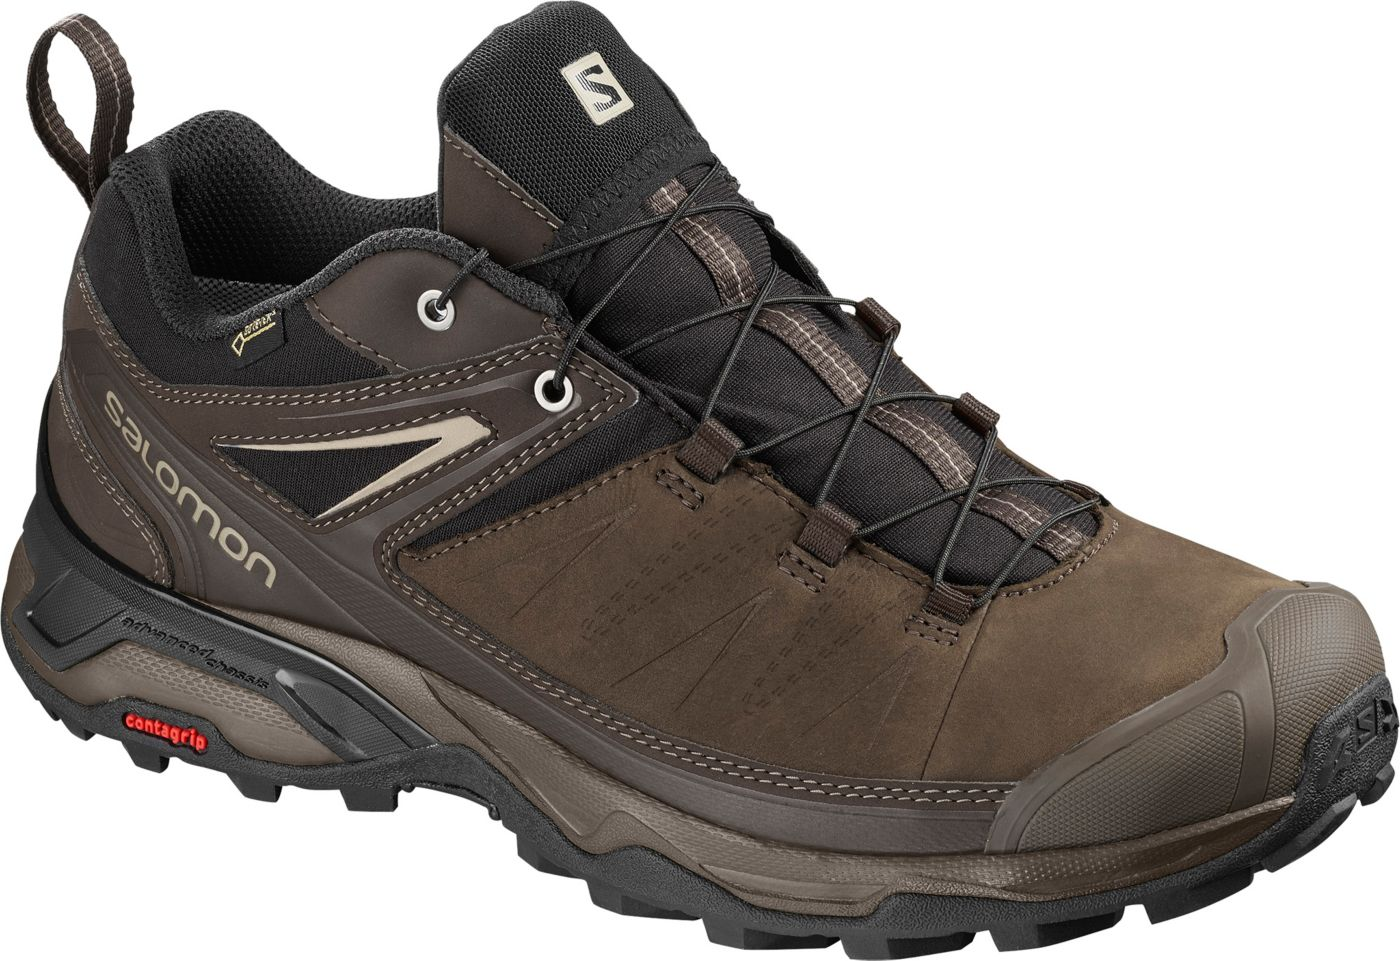 Salomon Men's X Ultra 3 LTR GTX Trail Running Shoes